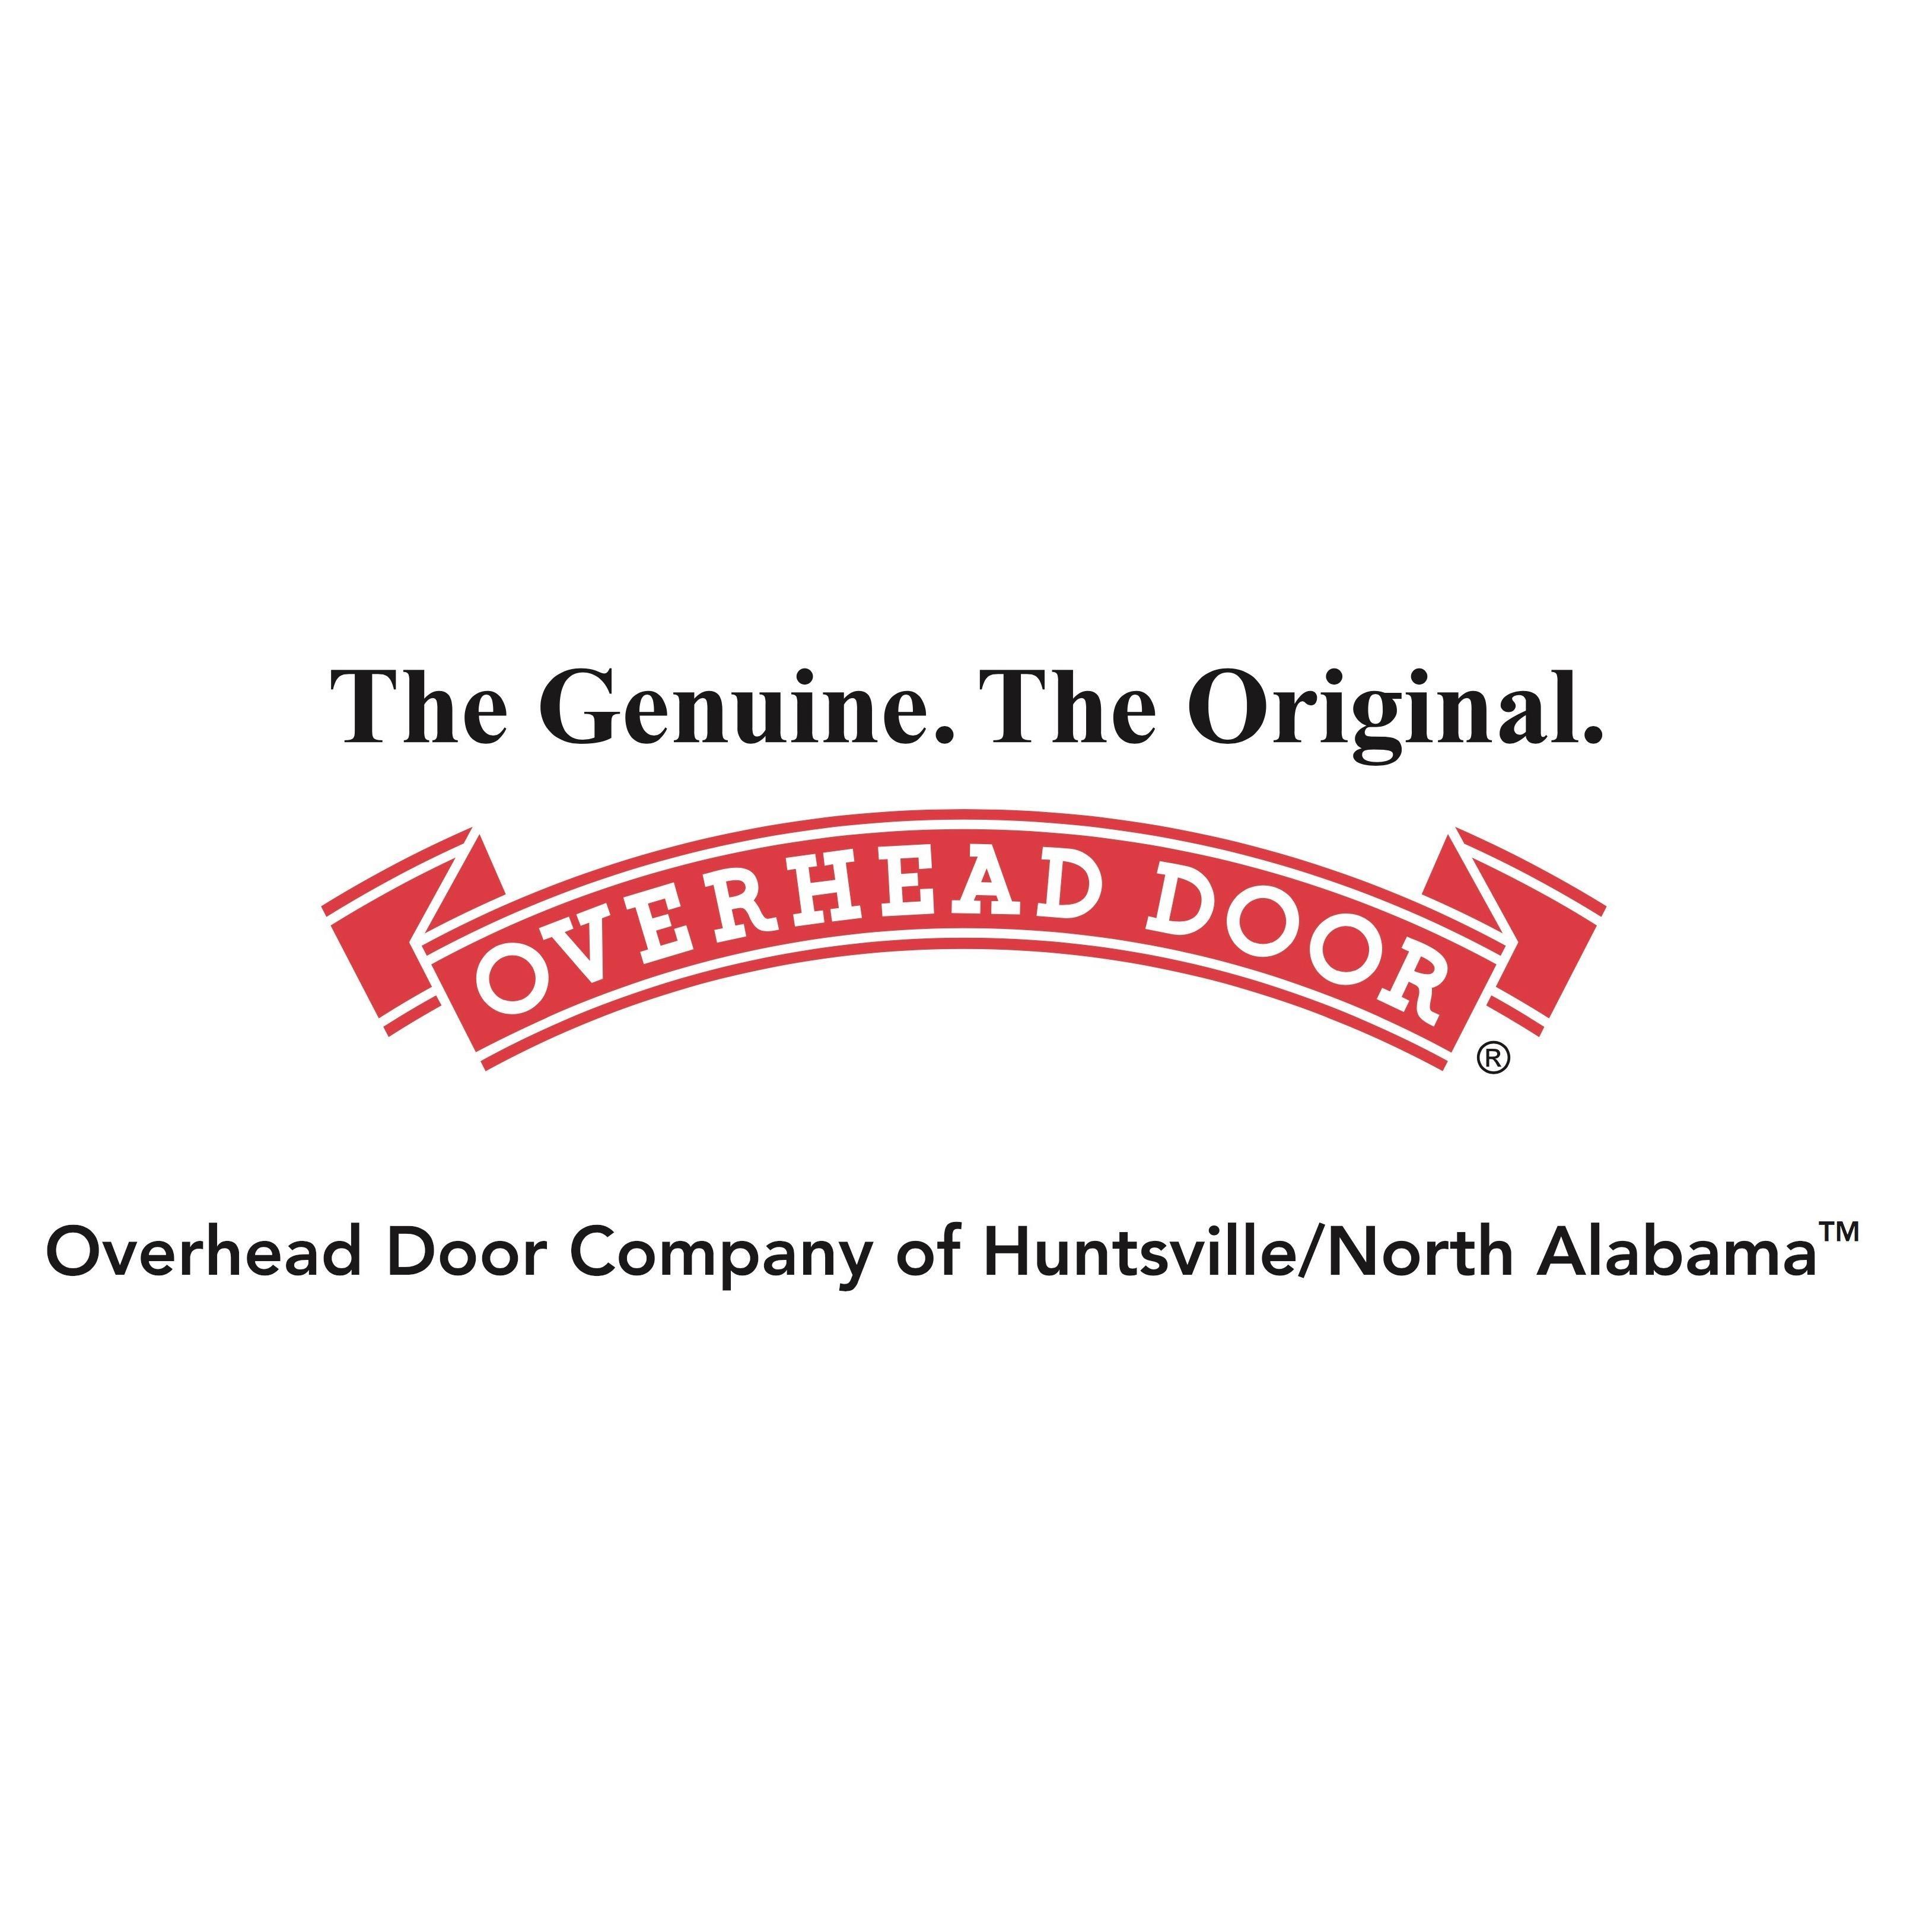 Overhead Door Company of Huntsville/North Alabama™